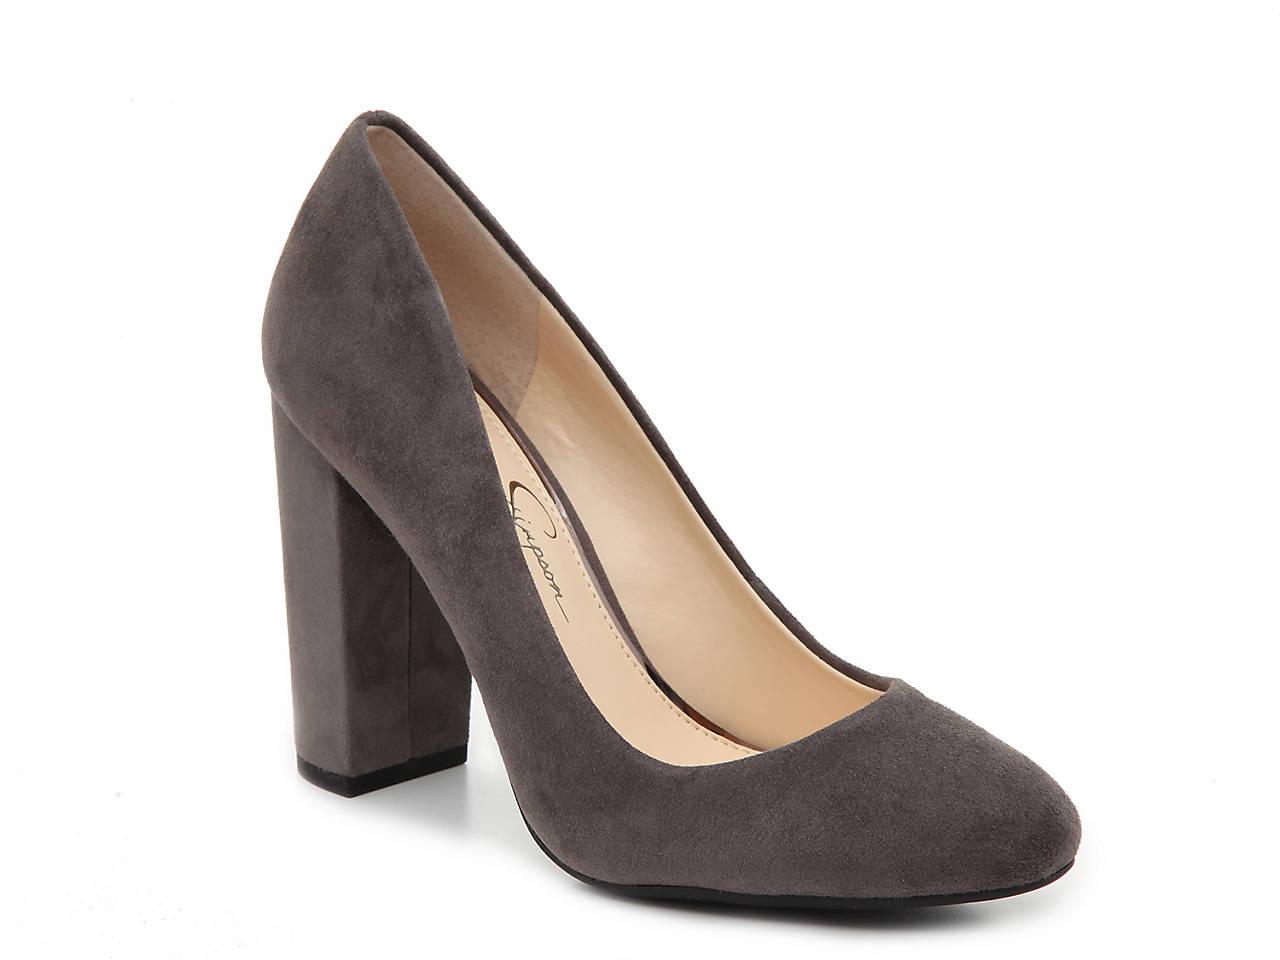 b11ffa7d52 Jessica Simpson Belemo Pump Women's Shoes   DSW